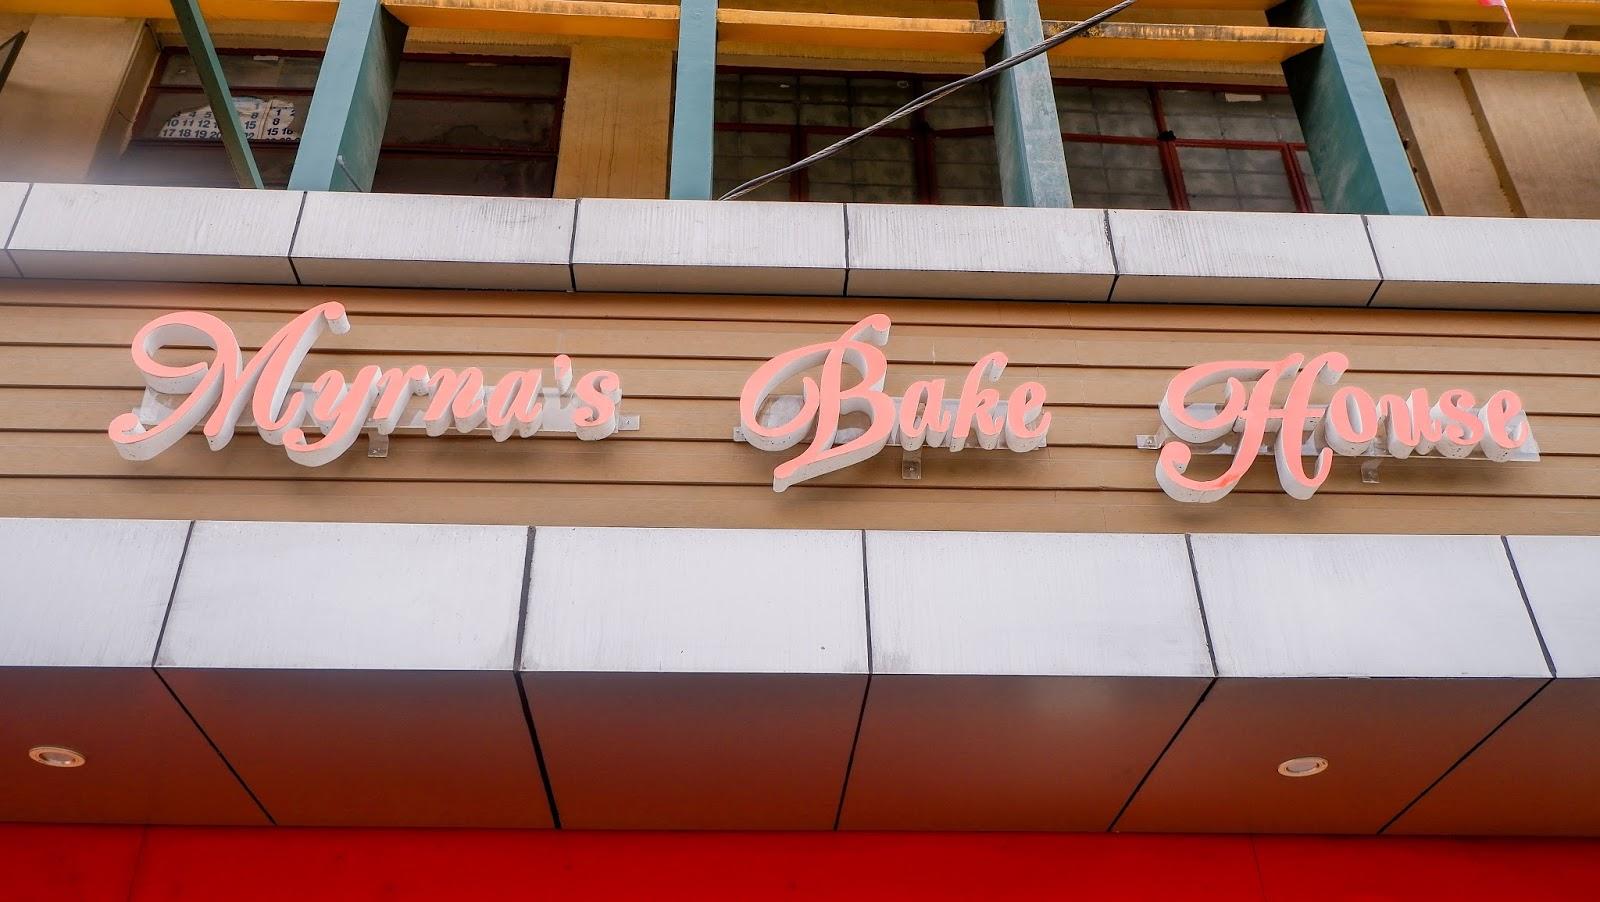 Myrna's Cafe and Bakeshop Zamboanga City